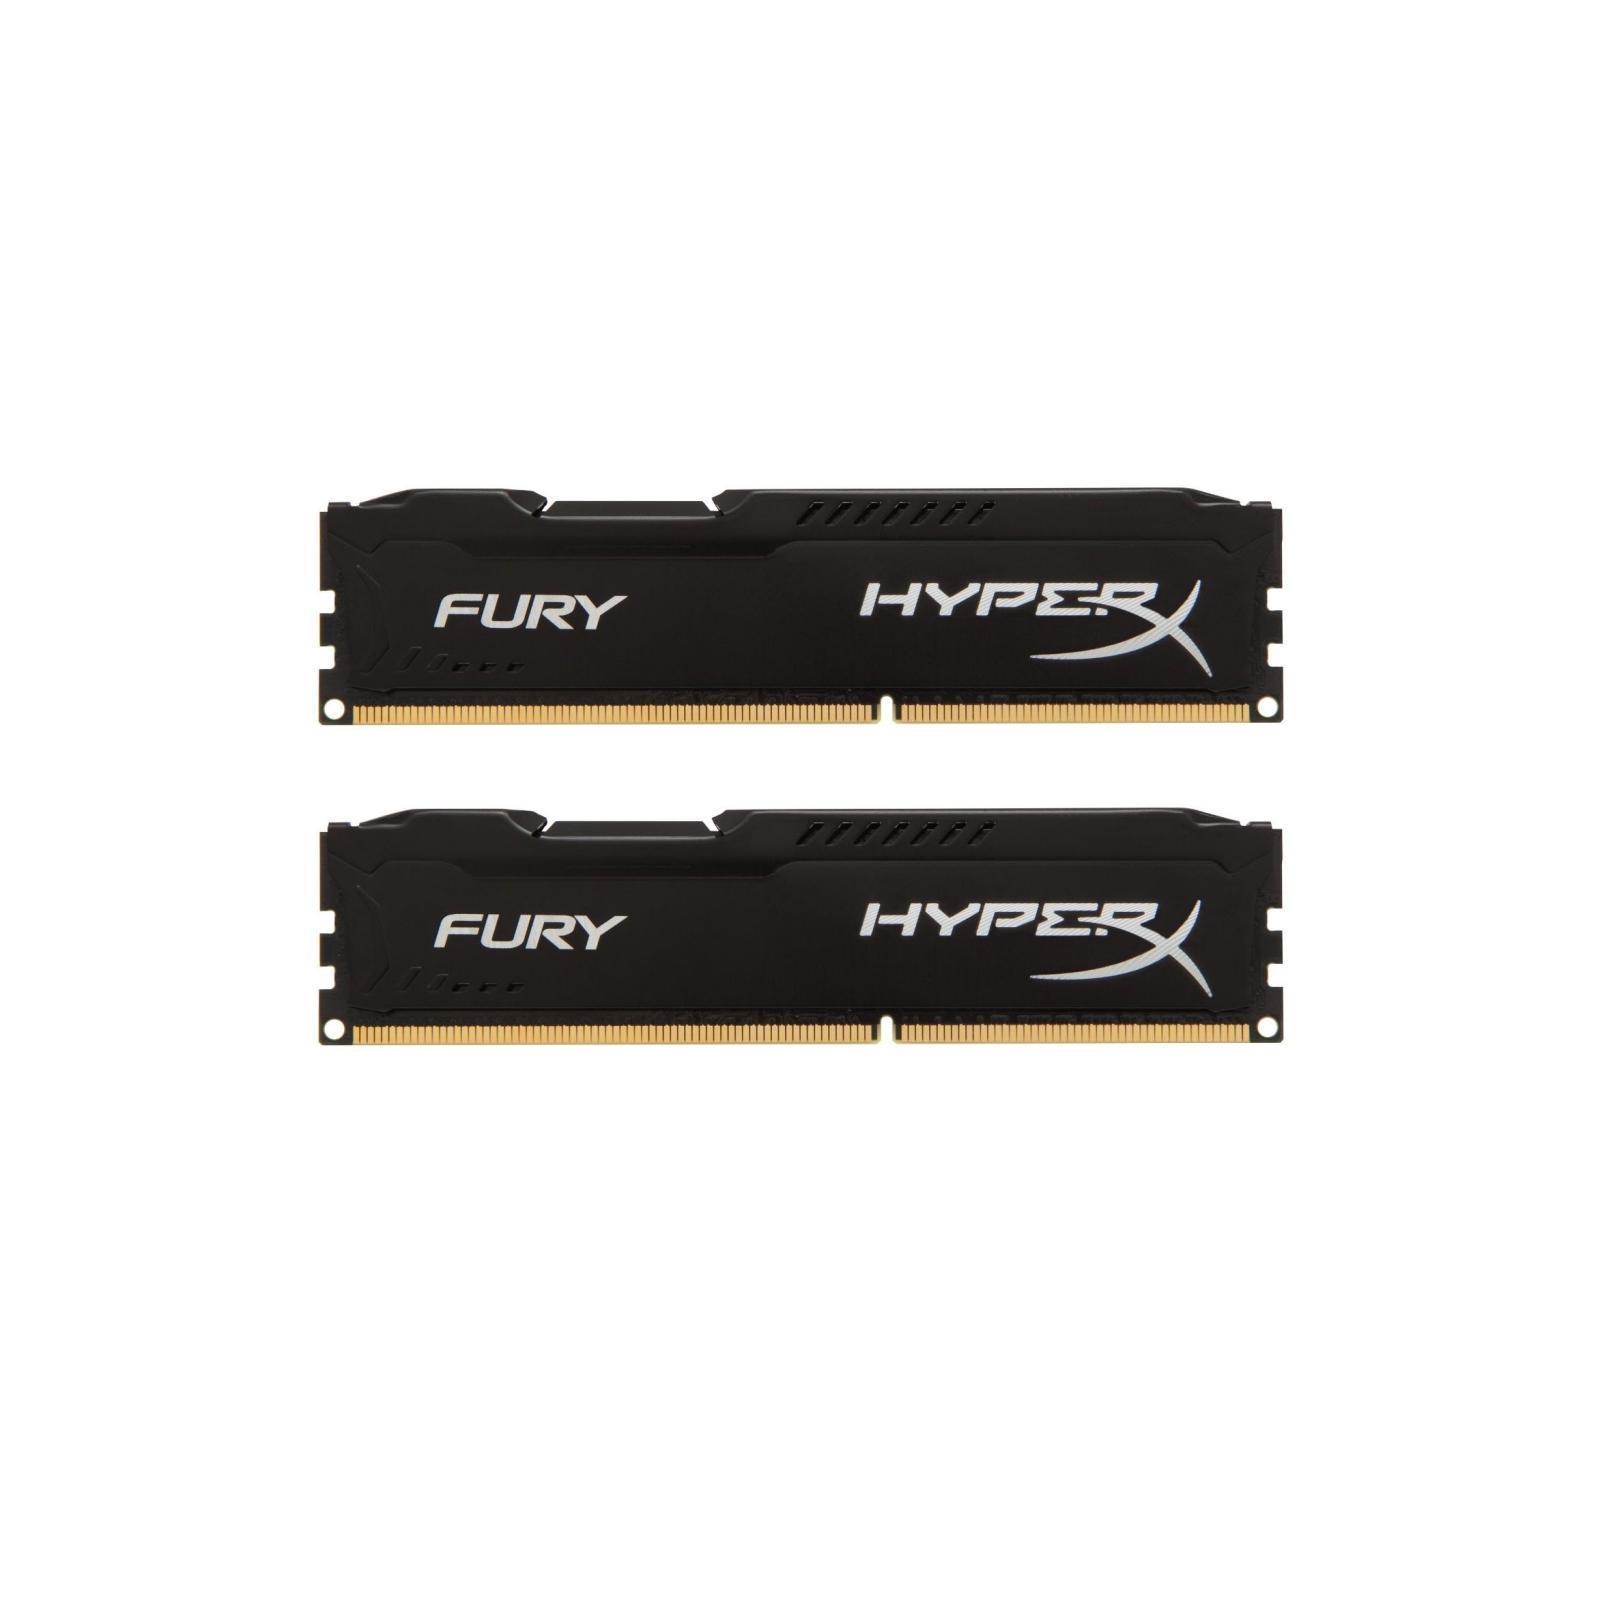 Модуль памяти для компьютера DDR4 32GB (2x16GB) 2933 MHz HyperX FURY Black HyperX (Kingston Fury) (HX429C17FBK2/32)